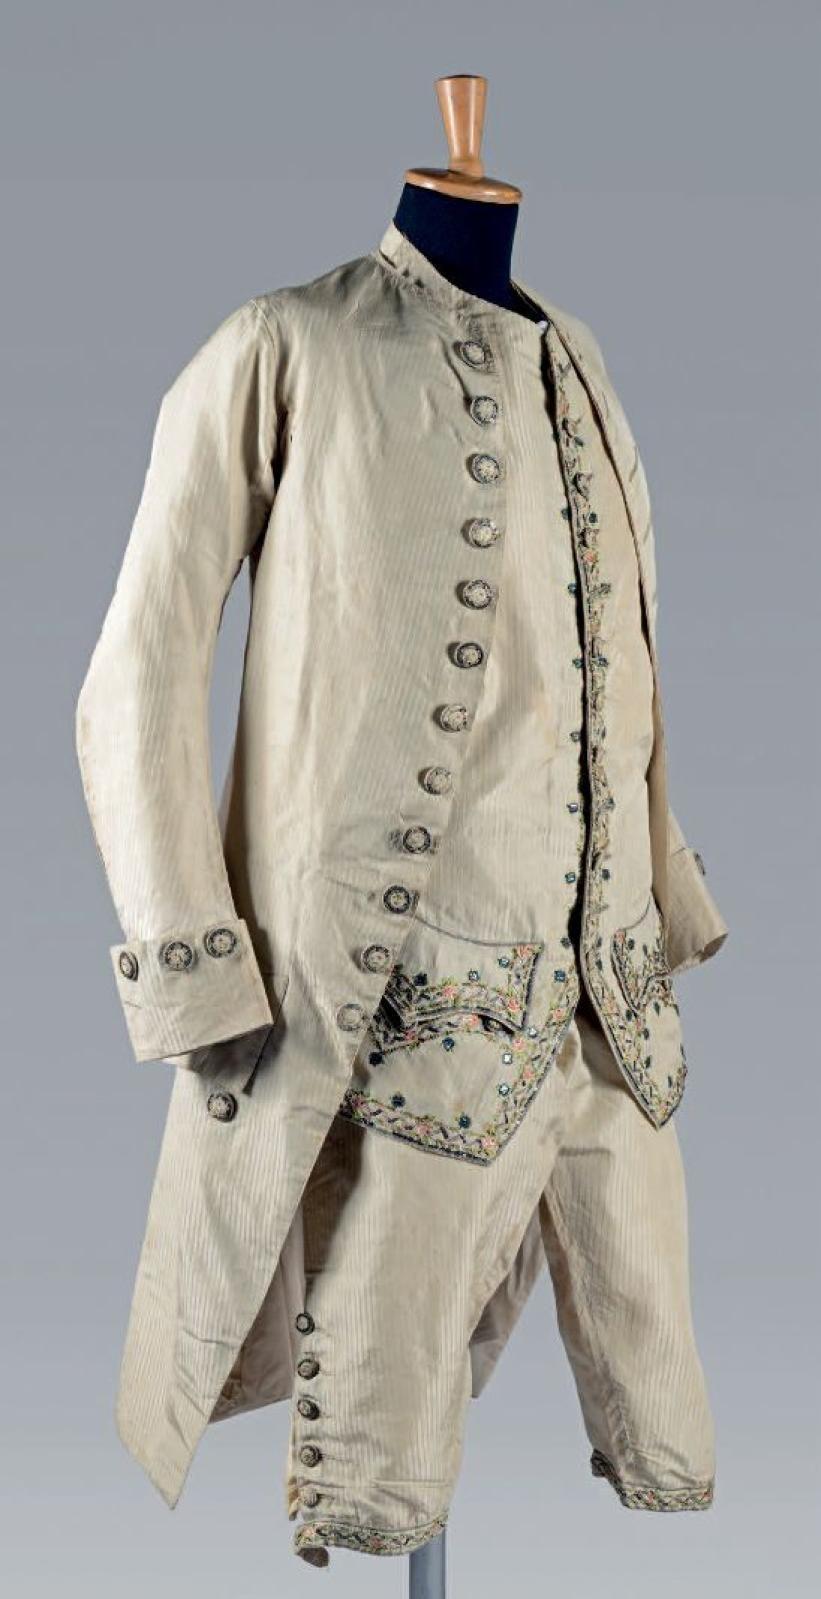 C 1790 Embroidered Man S Suit Silk Linen 18th Century Men S